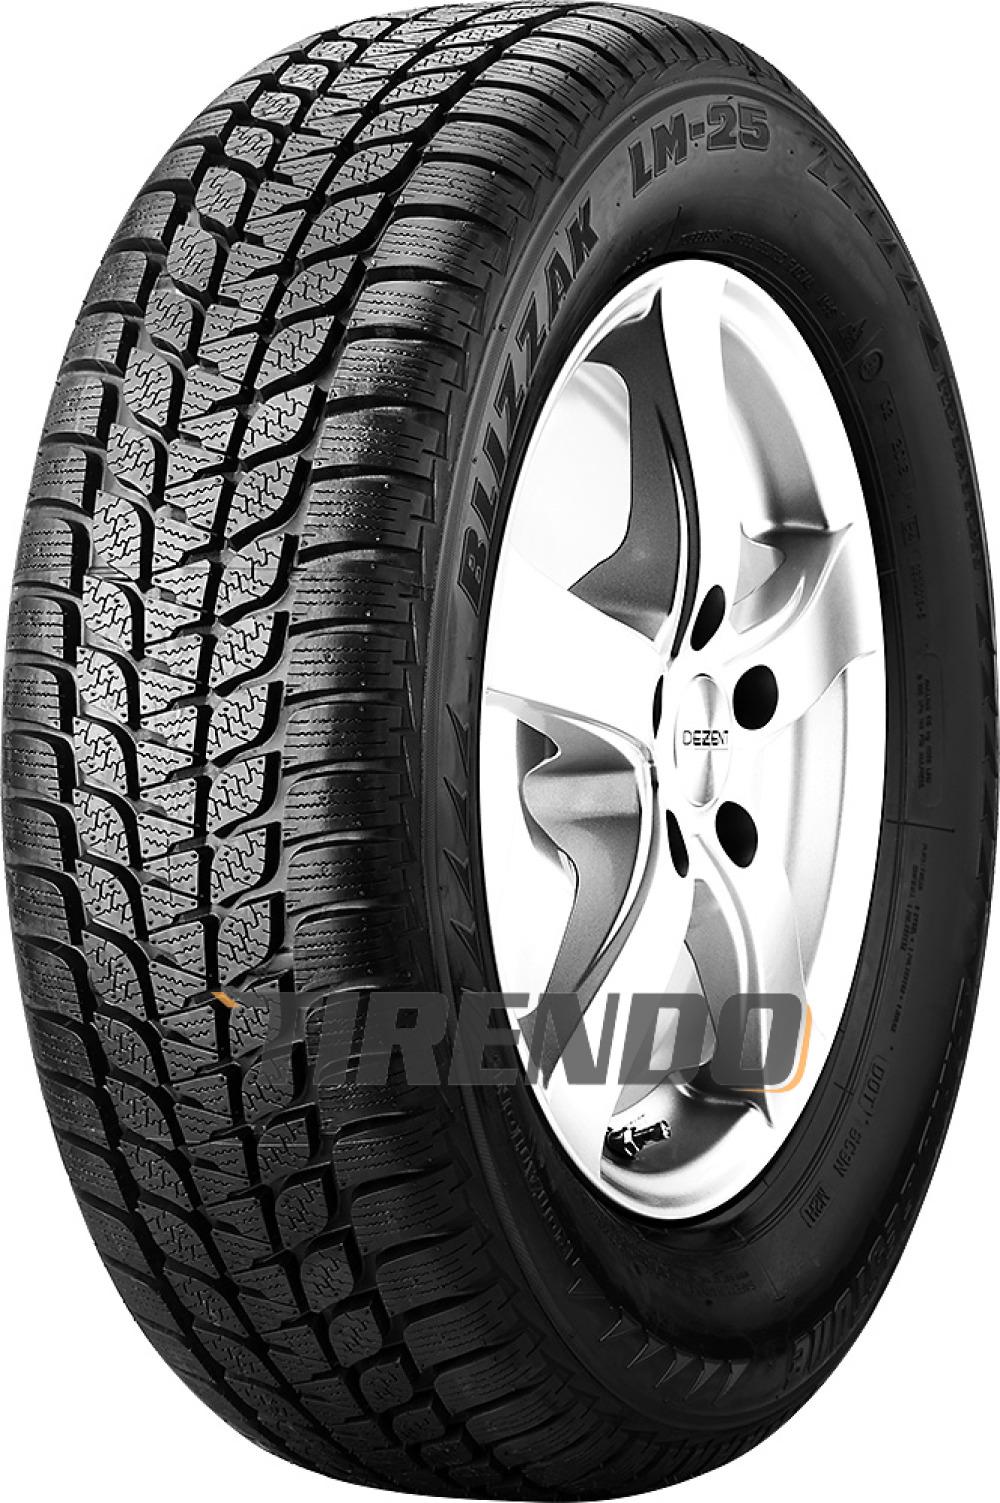 Bridgestone Blizzak LM-25 4x4 ( 265/70 R15 112T )